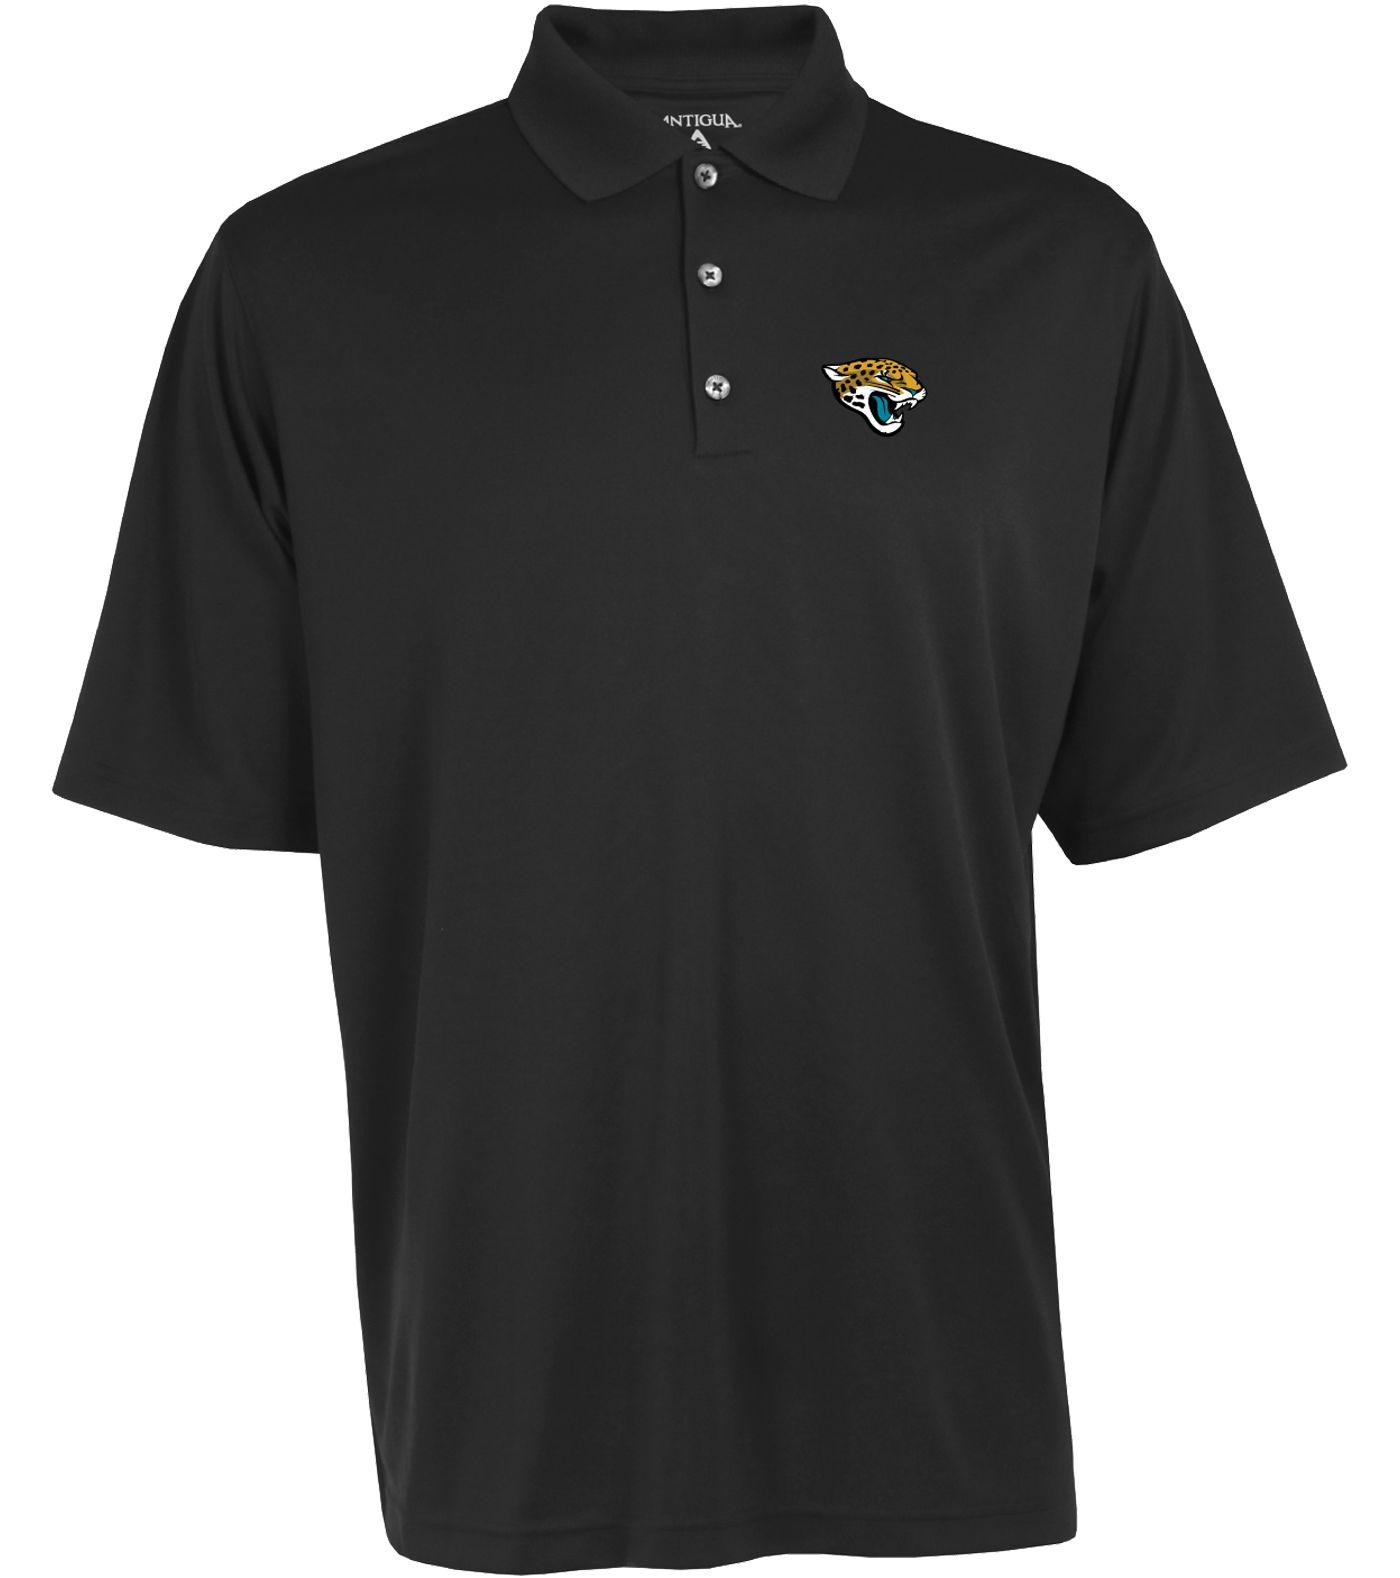 Antigua Men's Jacksonville Jaguars Exceed Polo